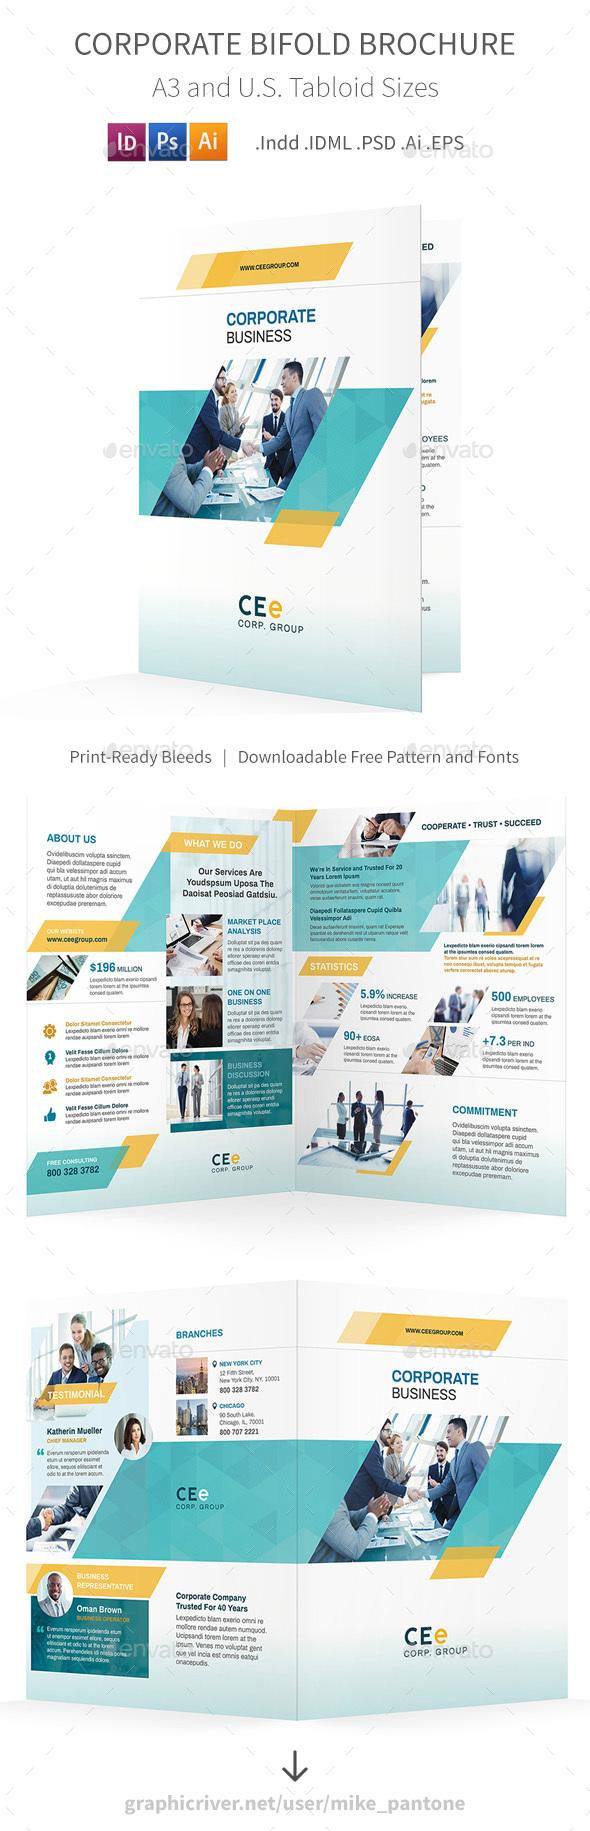 GraphicRiver Corporate Bifold Halffold Brochure 5 20812076